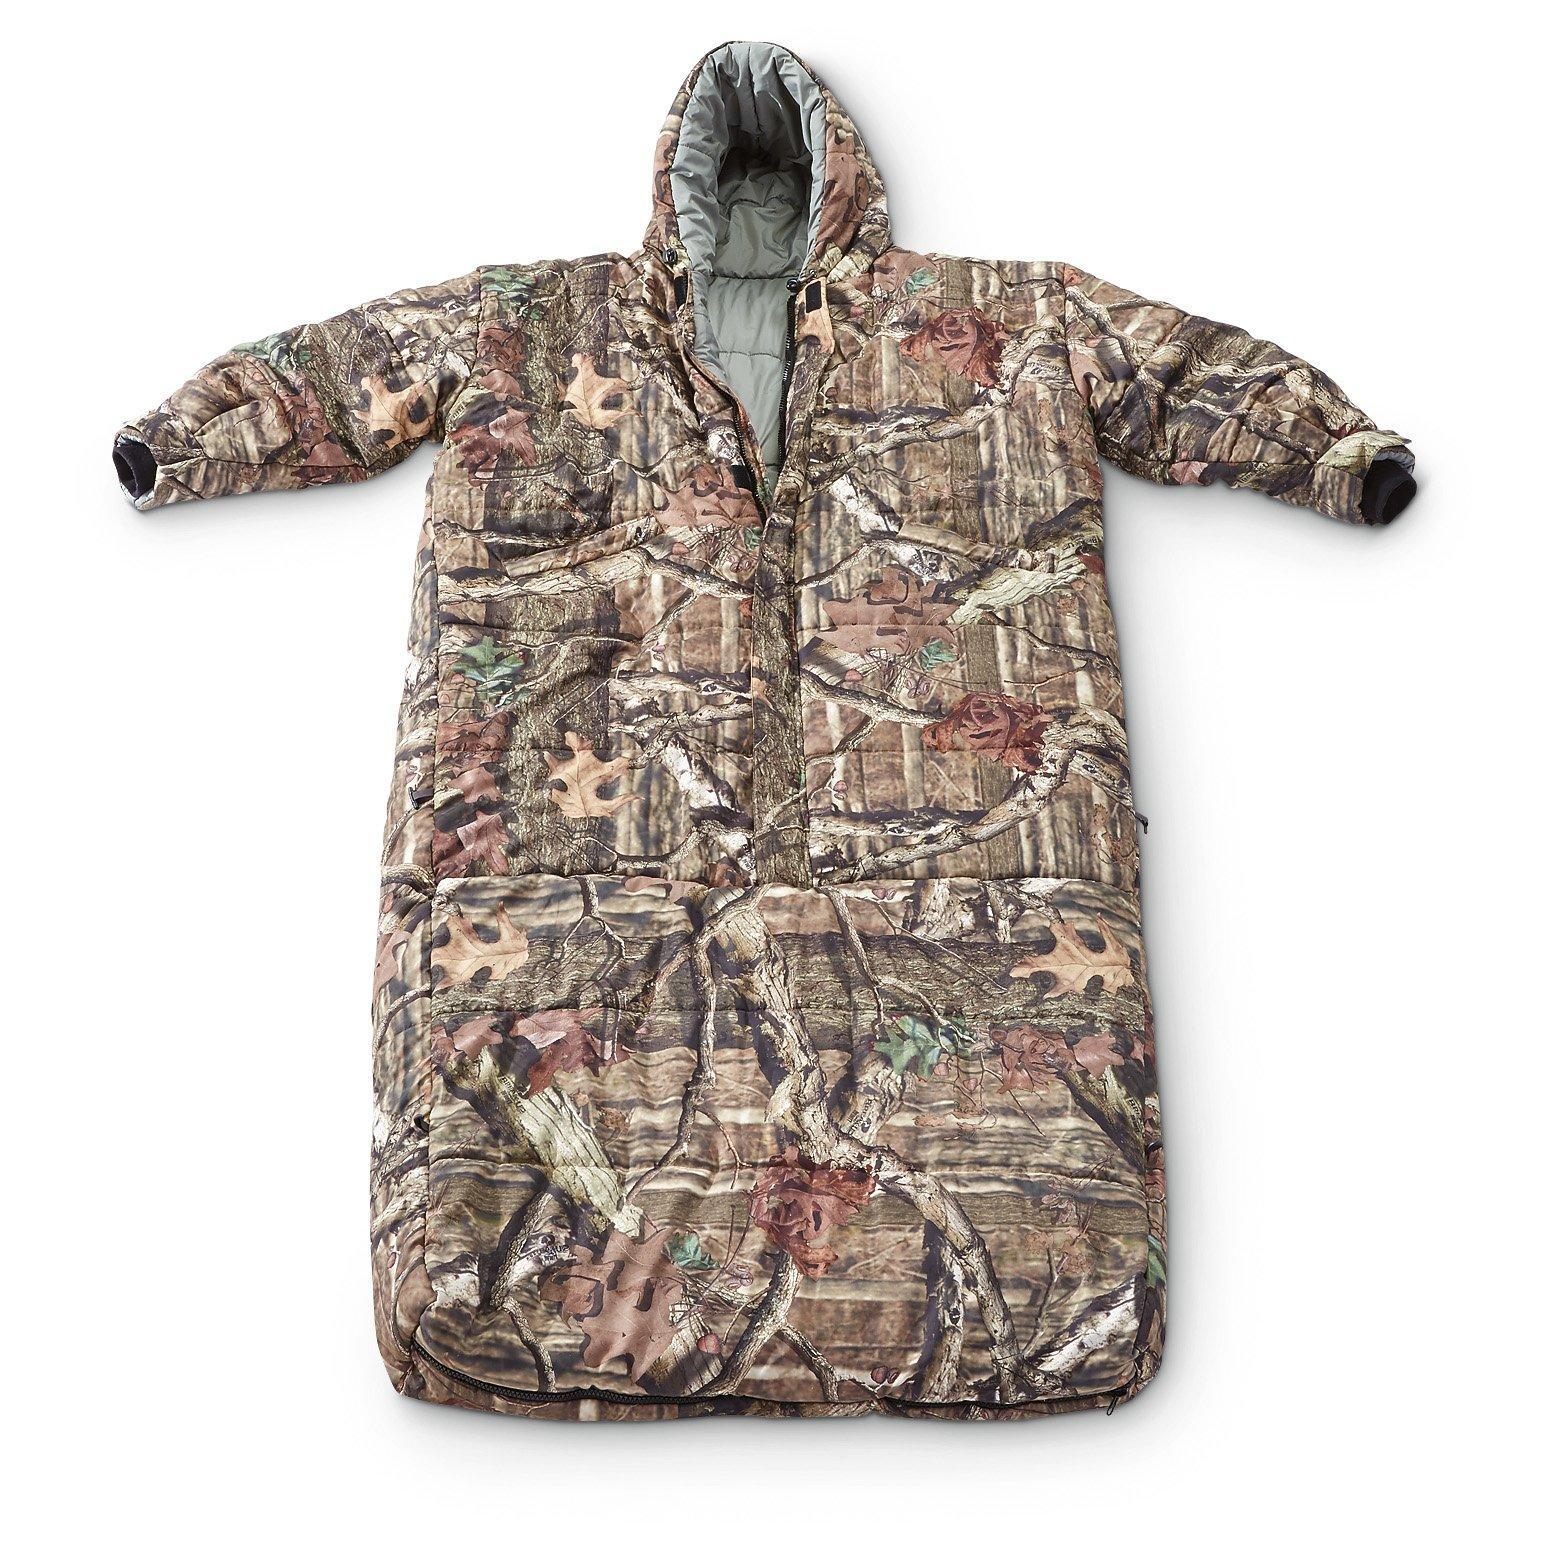 Guide Gear Hunting Sleeping Bag with Sleeves